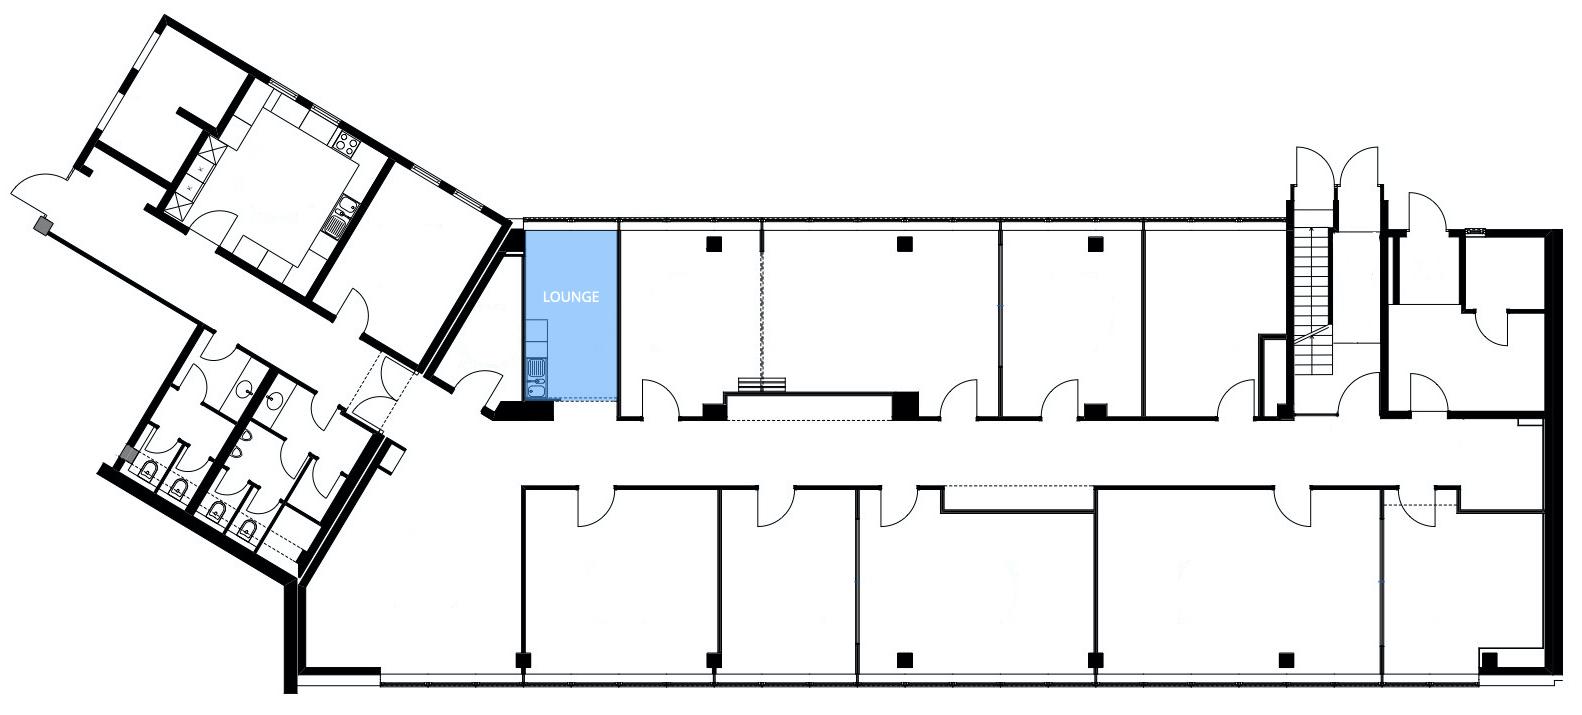 iTEMS Grundriss: Lounge